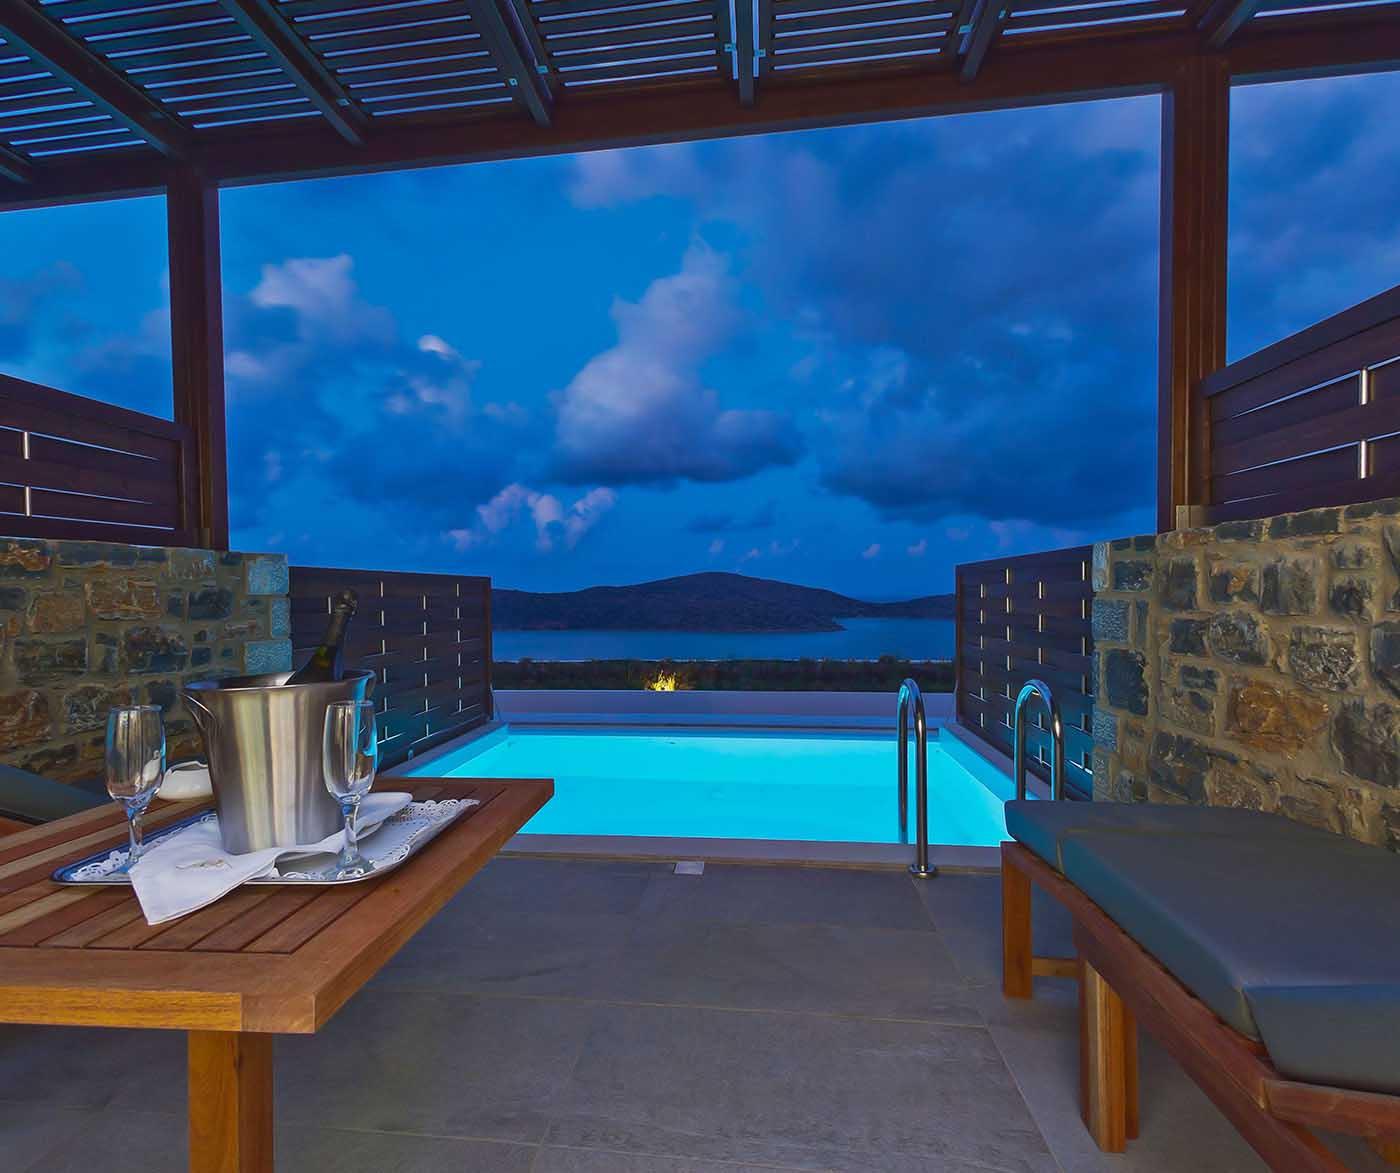 Arachova hotels & resorts, 50% discount for early bookings, Arachova, Voiotia, Sterea Hellas, Greece